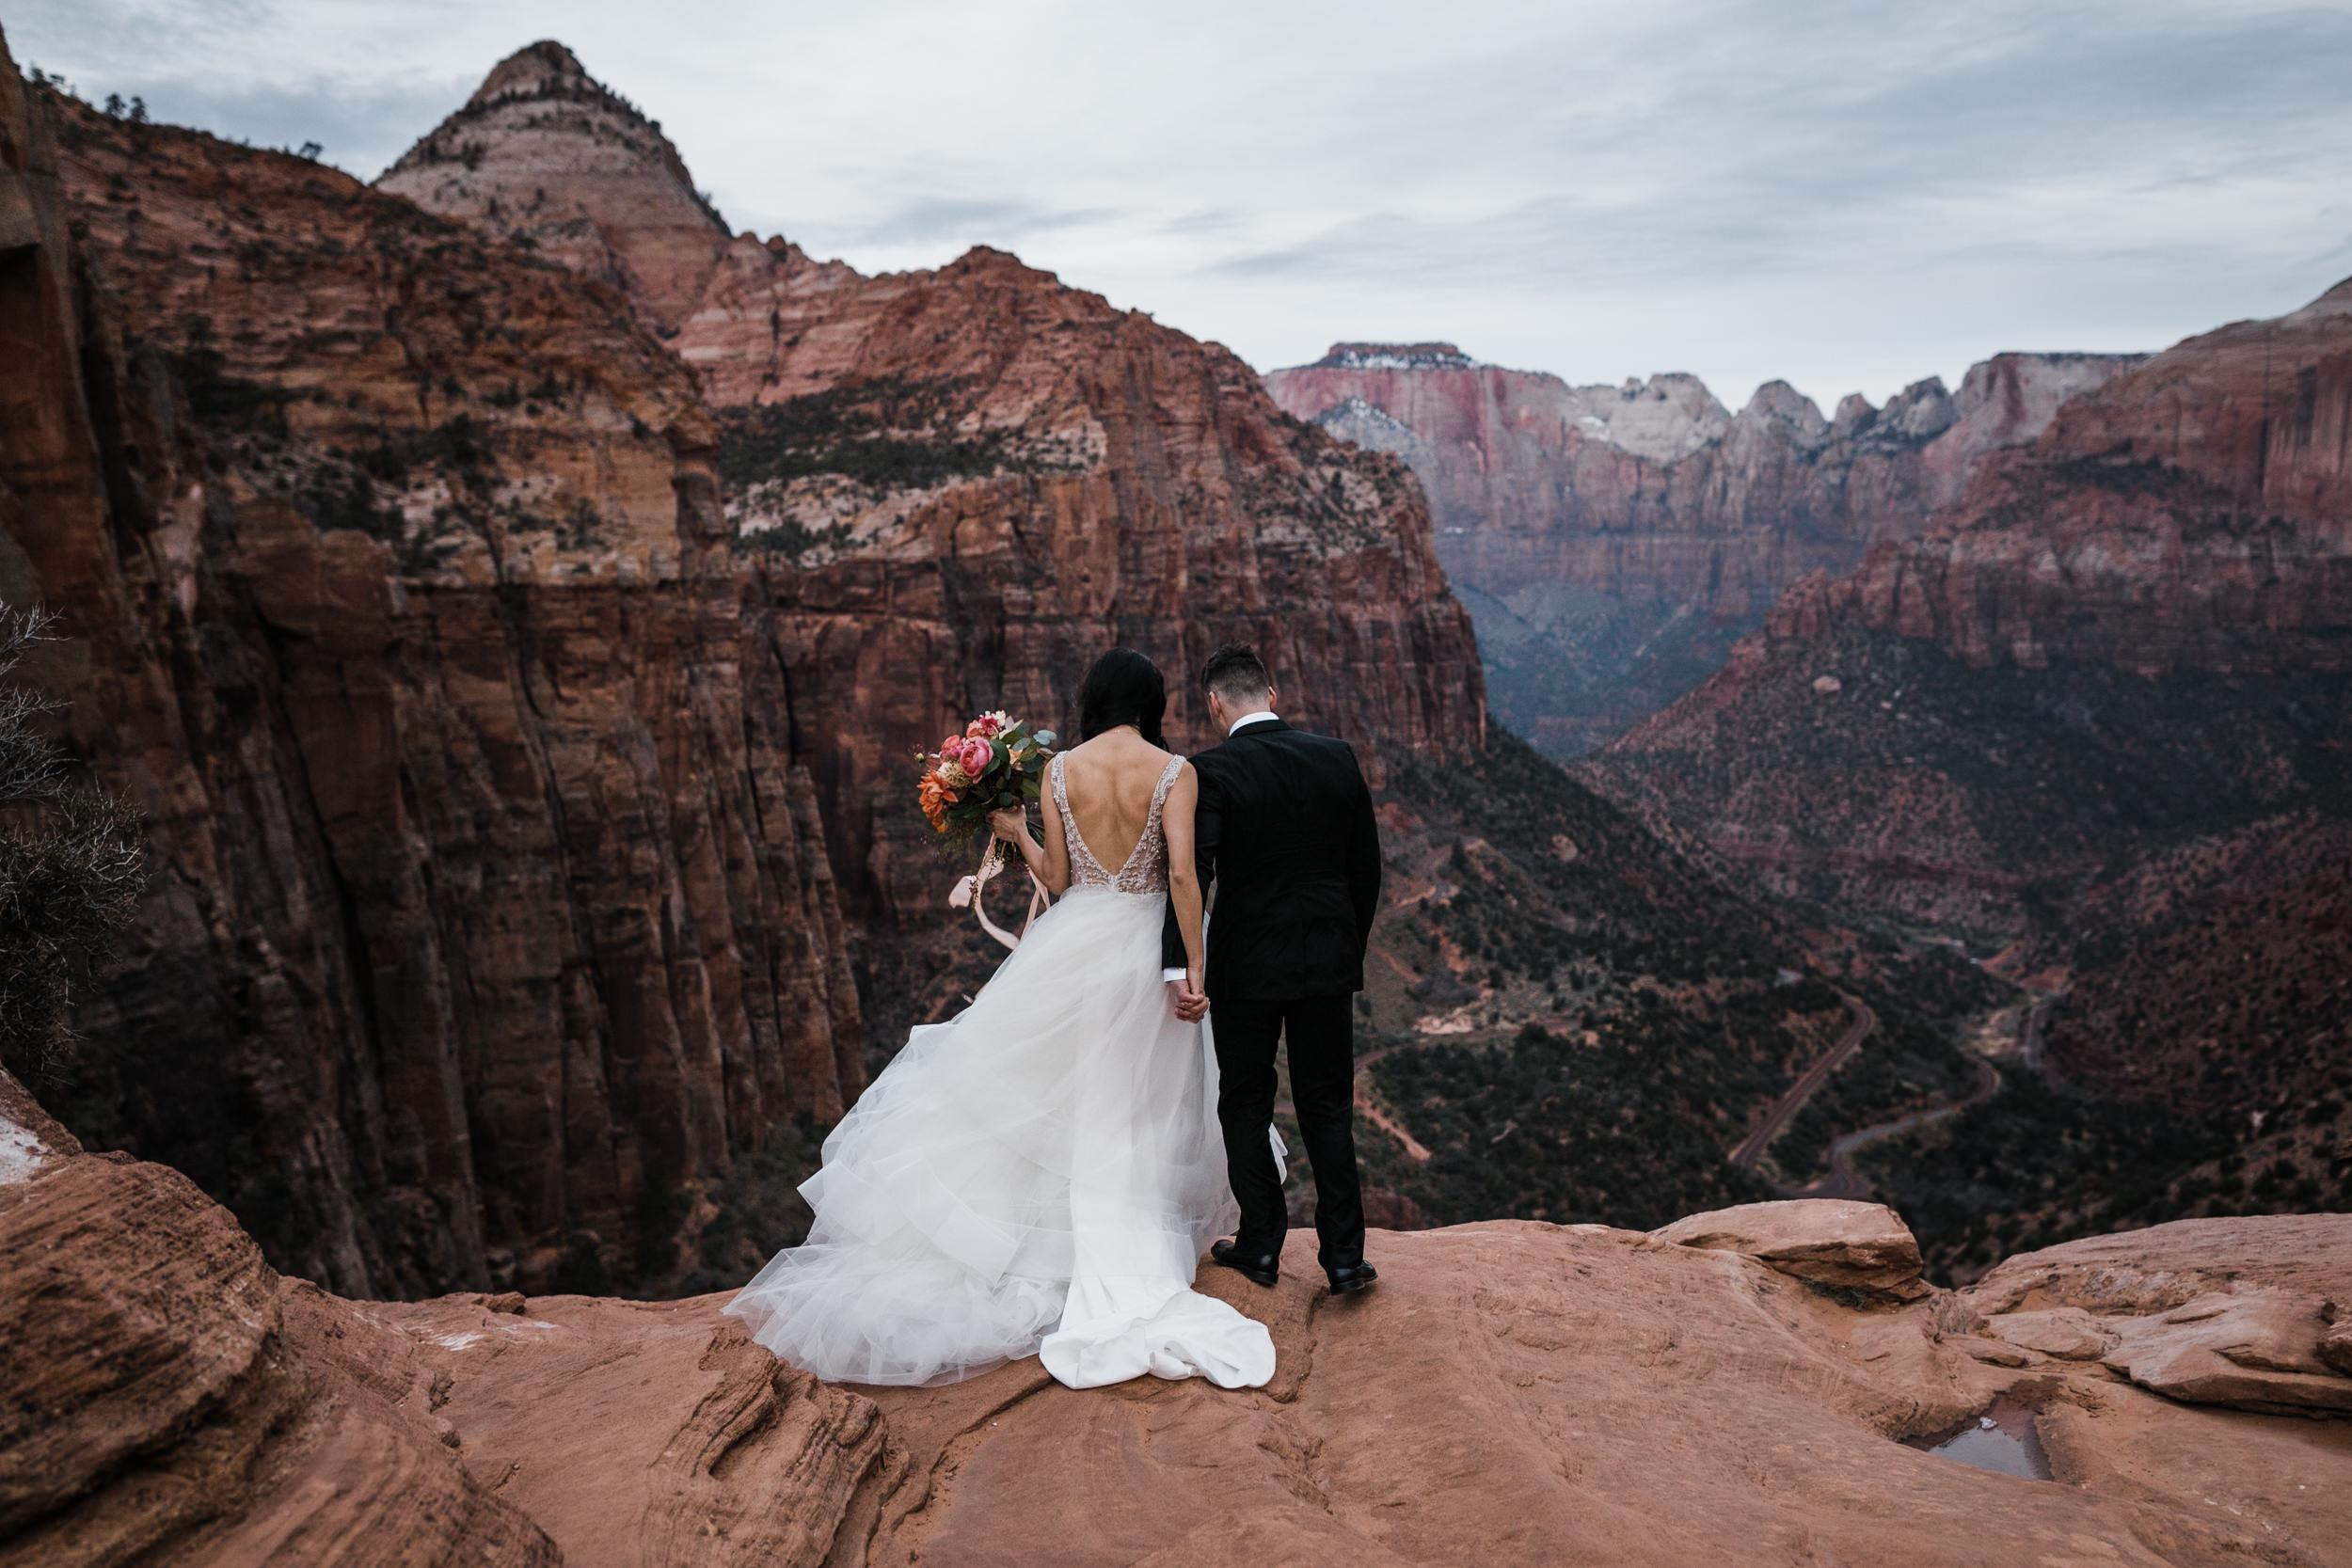 Zion-National-Park-Sunrise-Elopement-Hearnes-Wedding-Photography-13.jpg